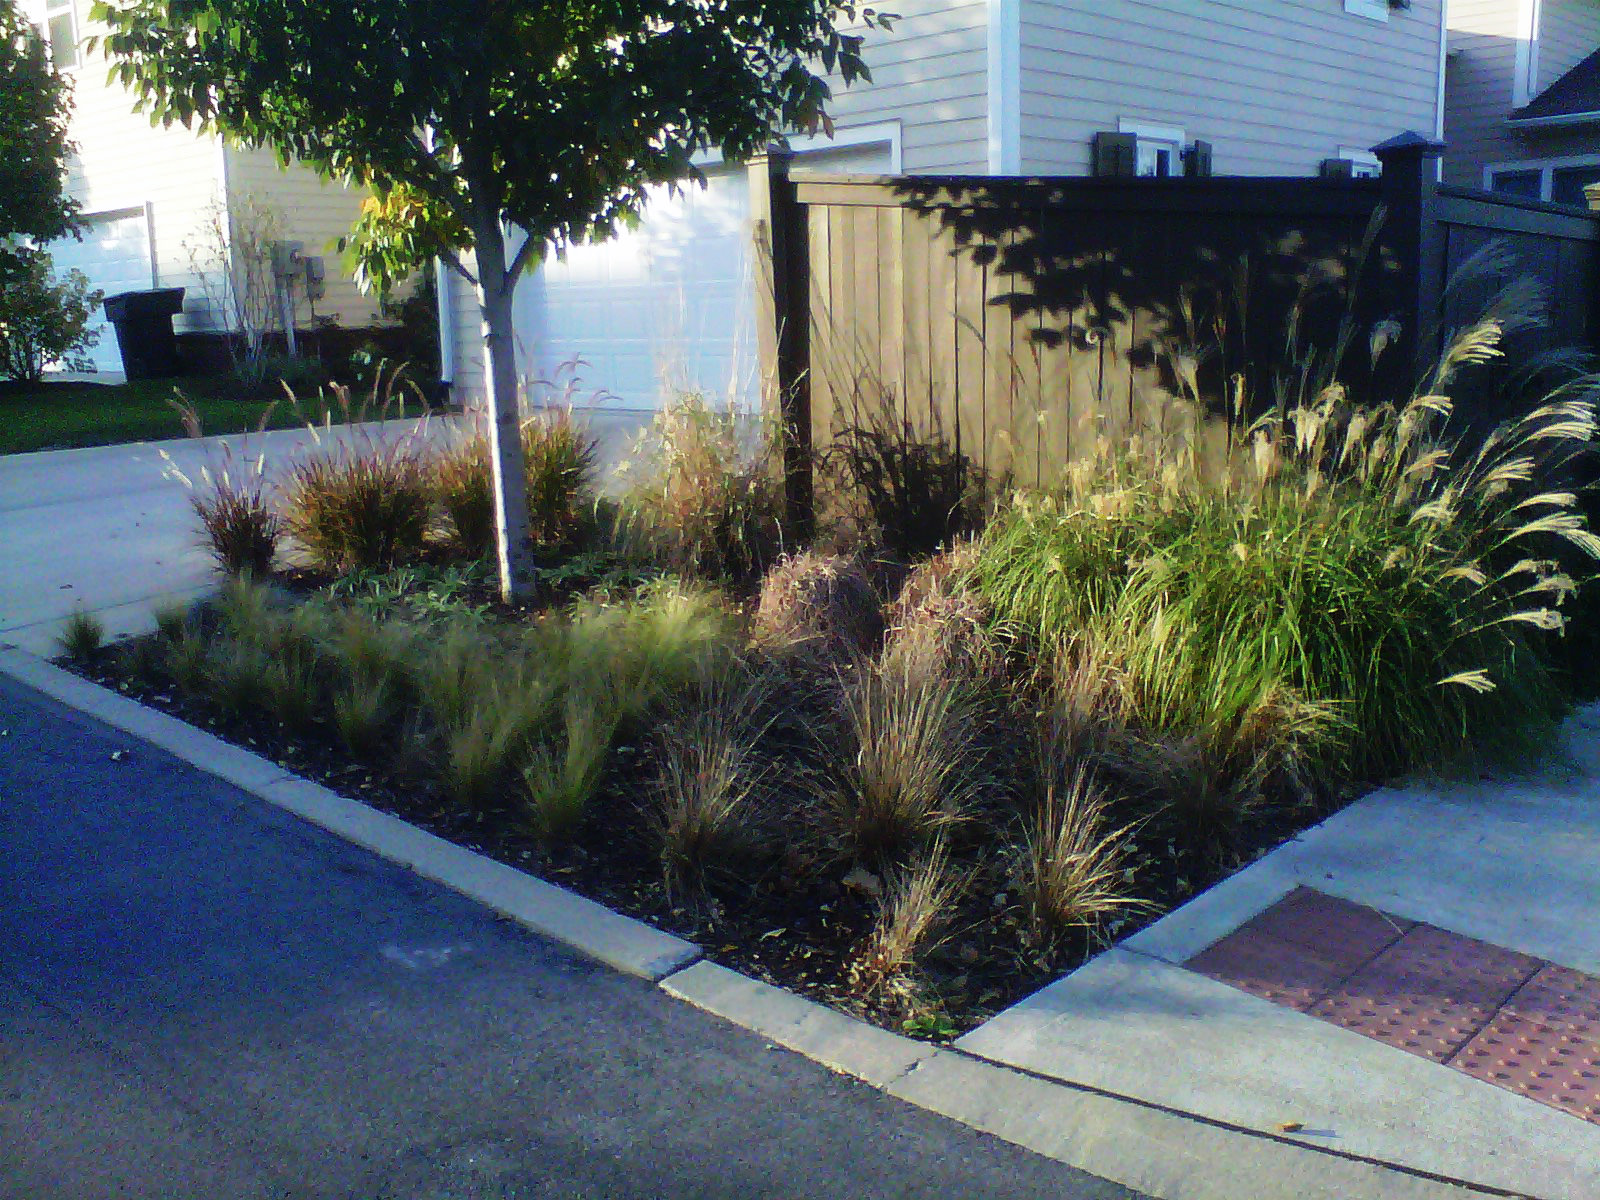 Justin Stelter Landscape Gardening - Modern Suburban Landscaping - 12591616935_b4d9ce9ba3_o.jpg